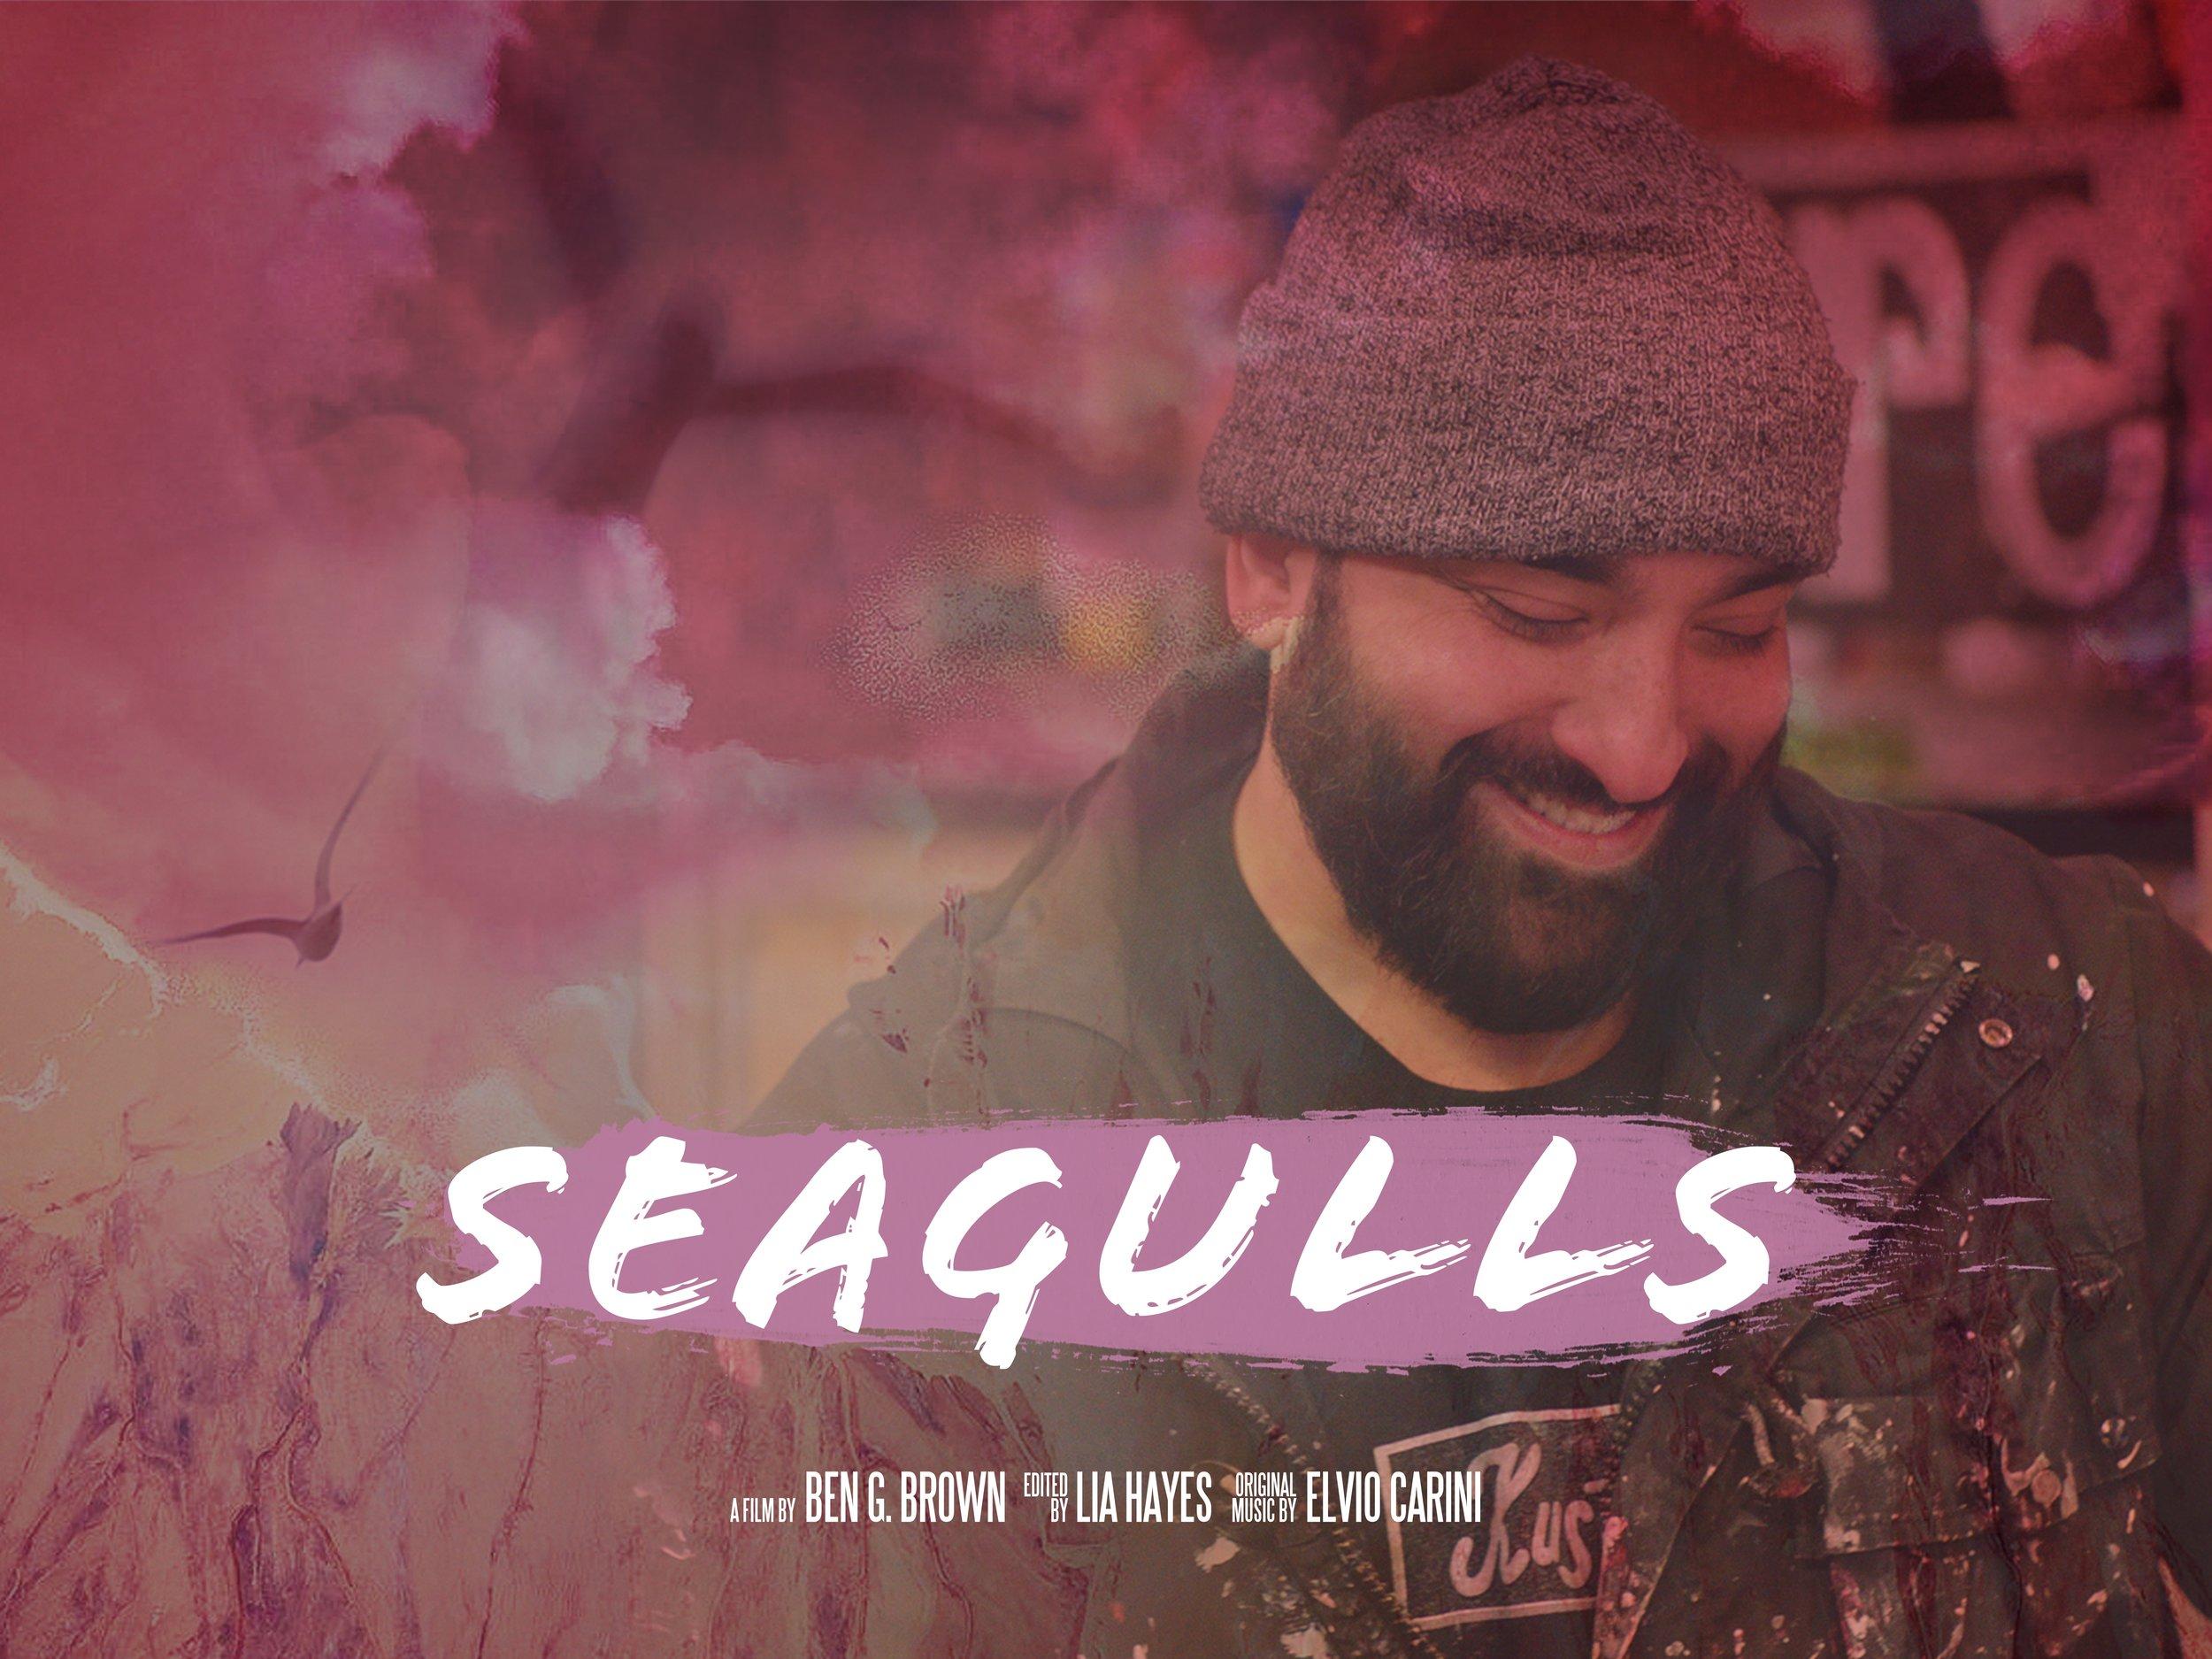 SEAGULLS | 2019 | 10 MINS | COMING SOON